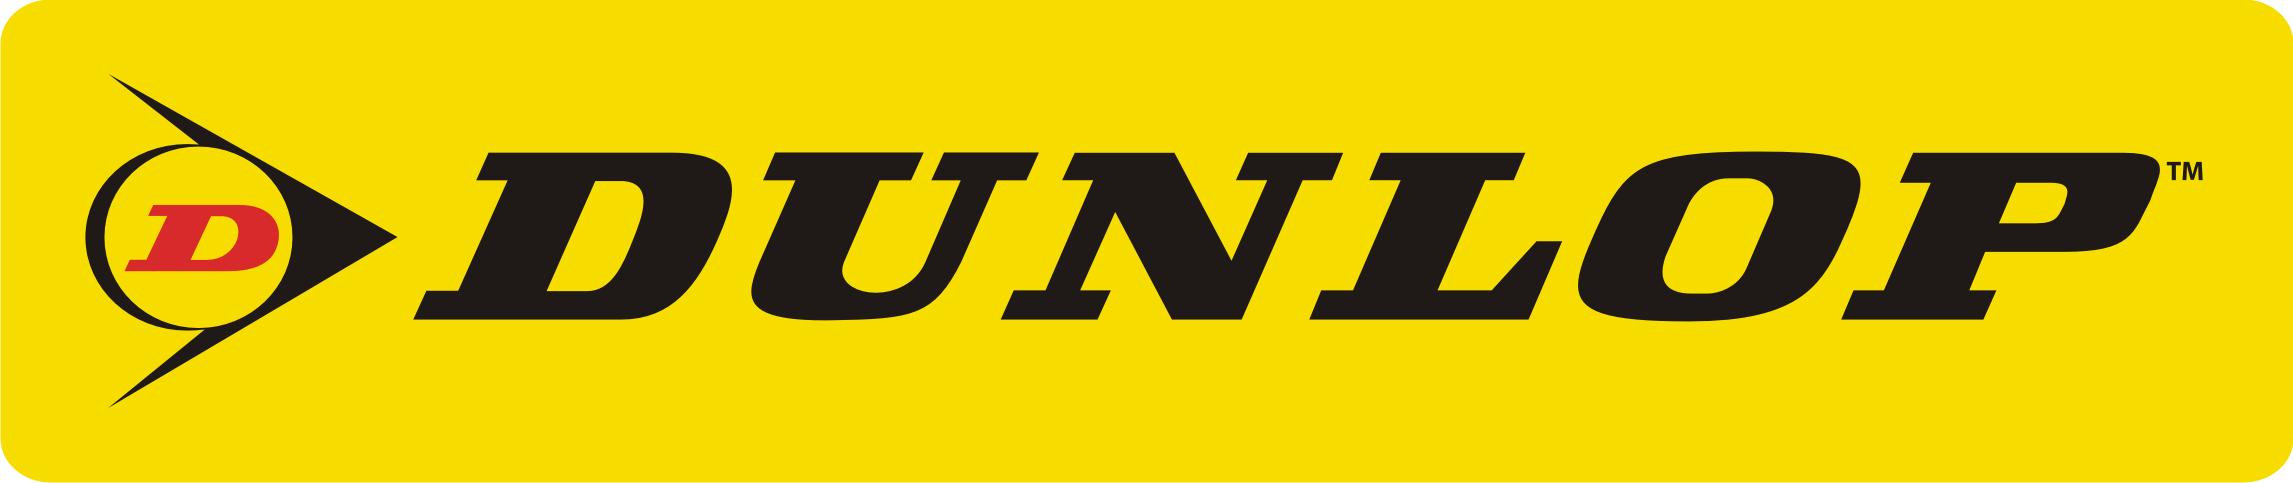 Dunlop Tyres Glasgow